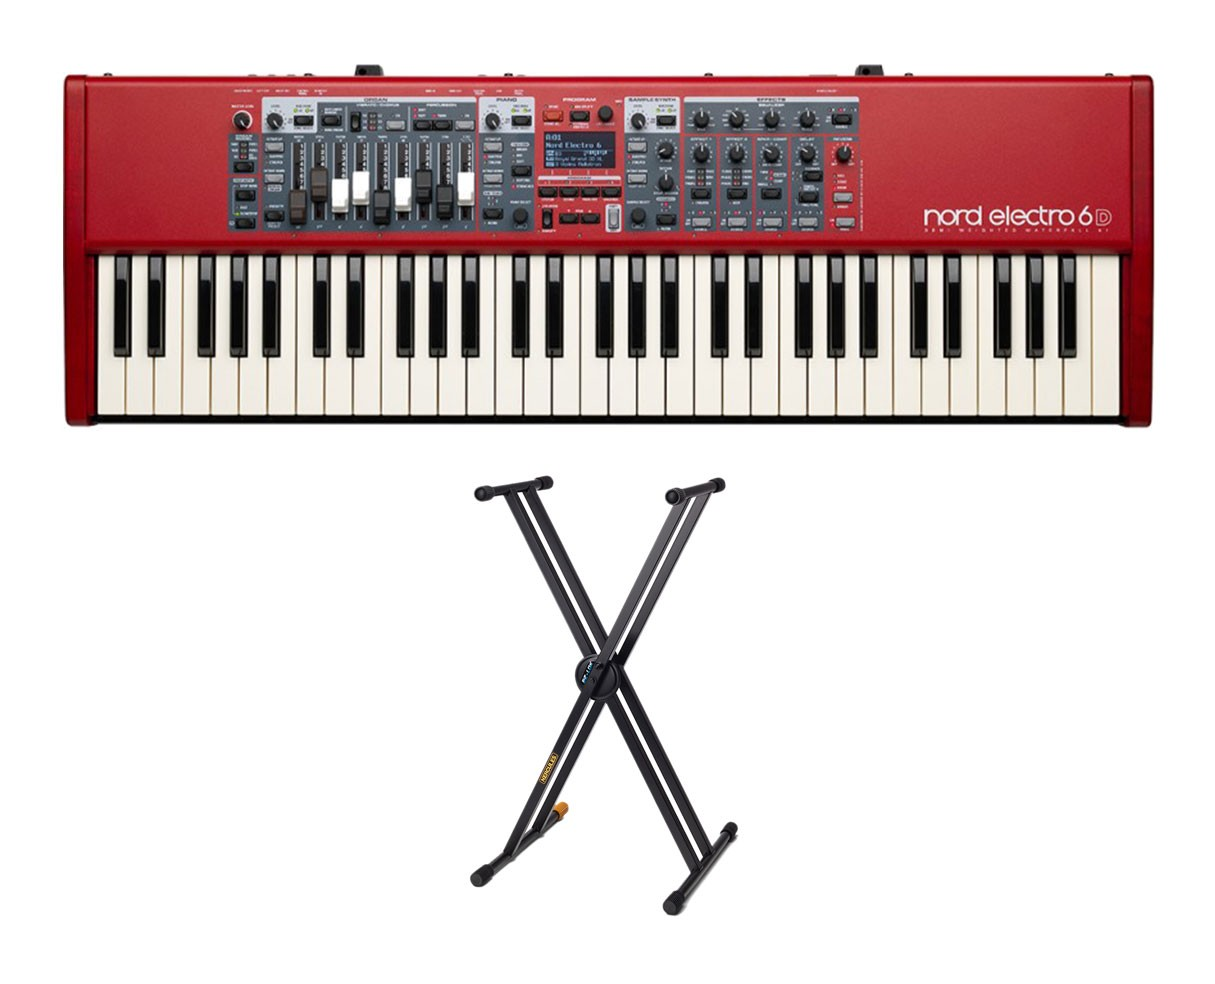 Nord Electro 6D 61 + Hercules KS120B Keyboard Stand